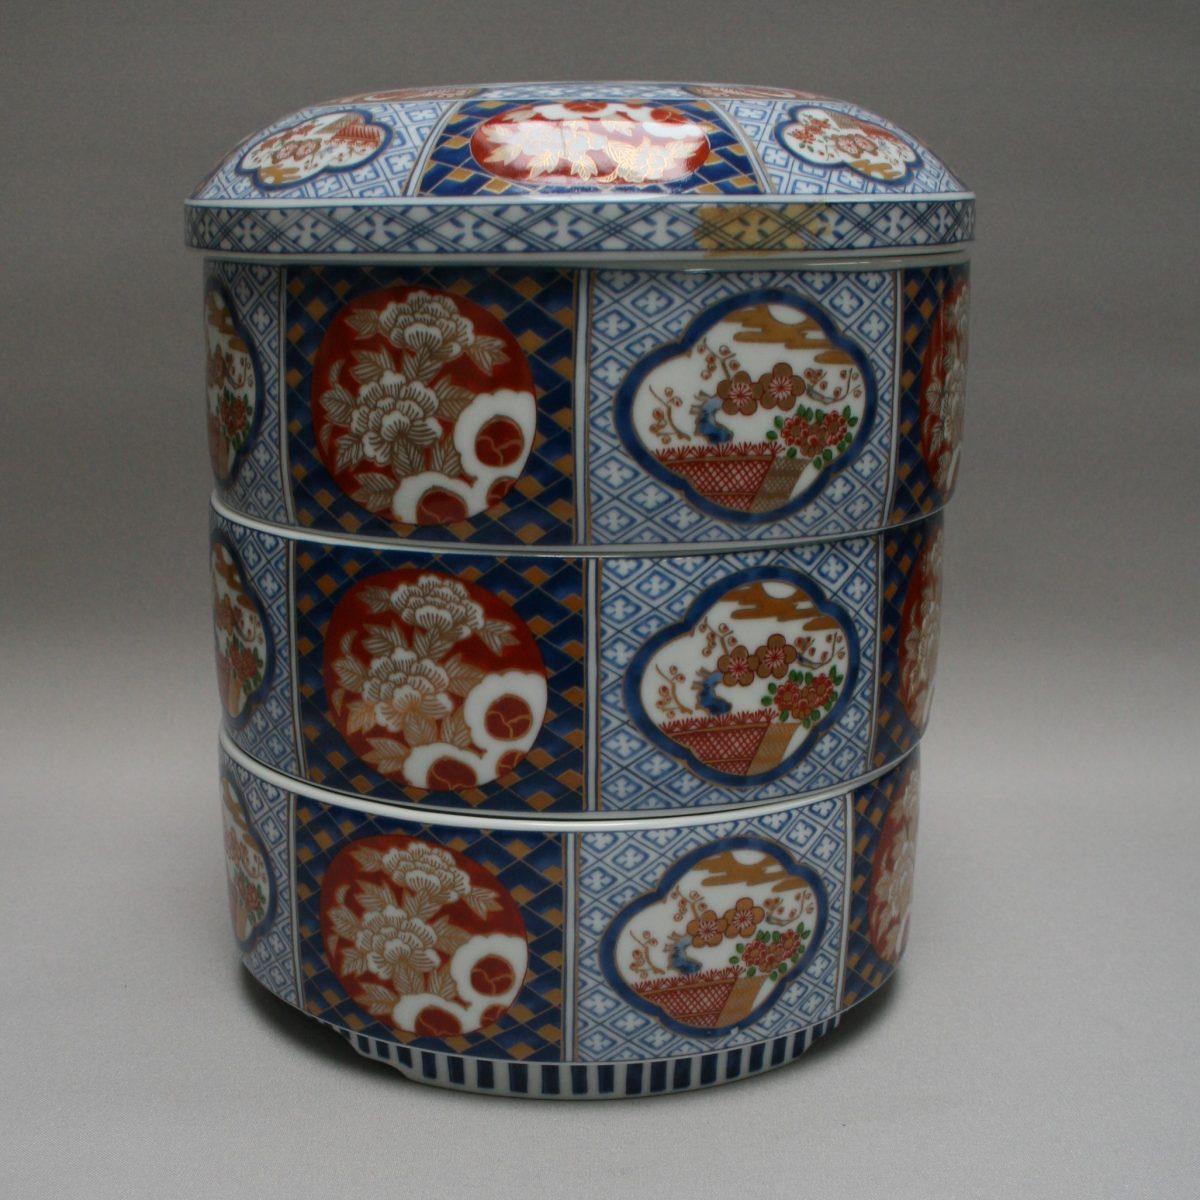 three tiered Chinese food storage box/williamsantiques